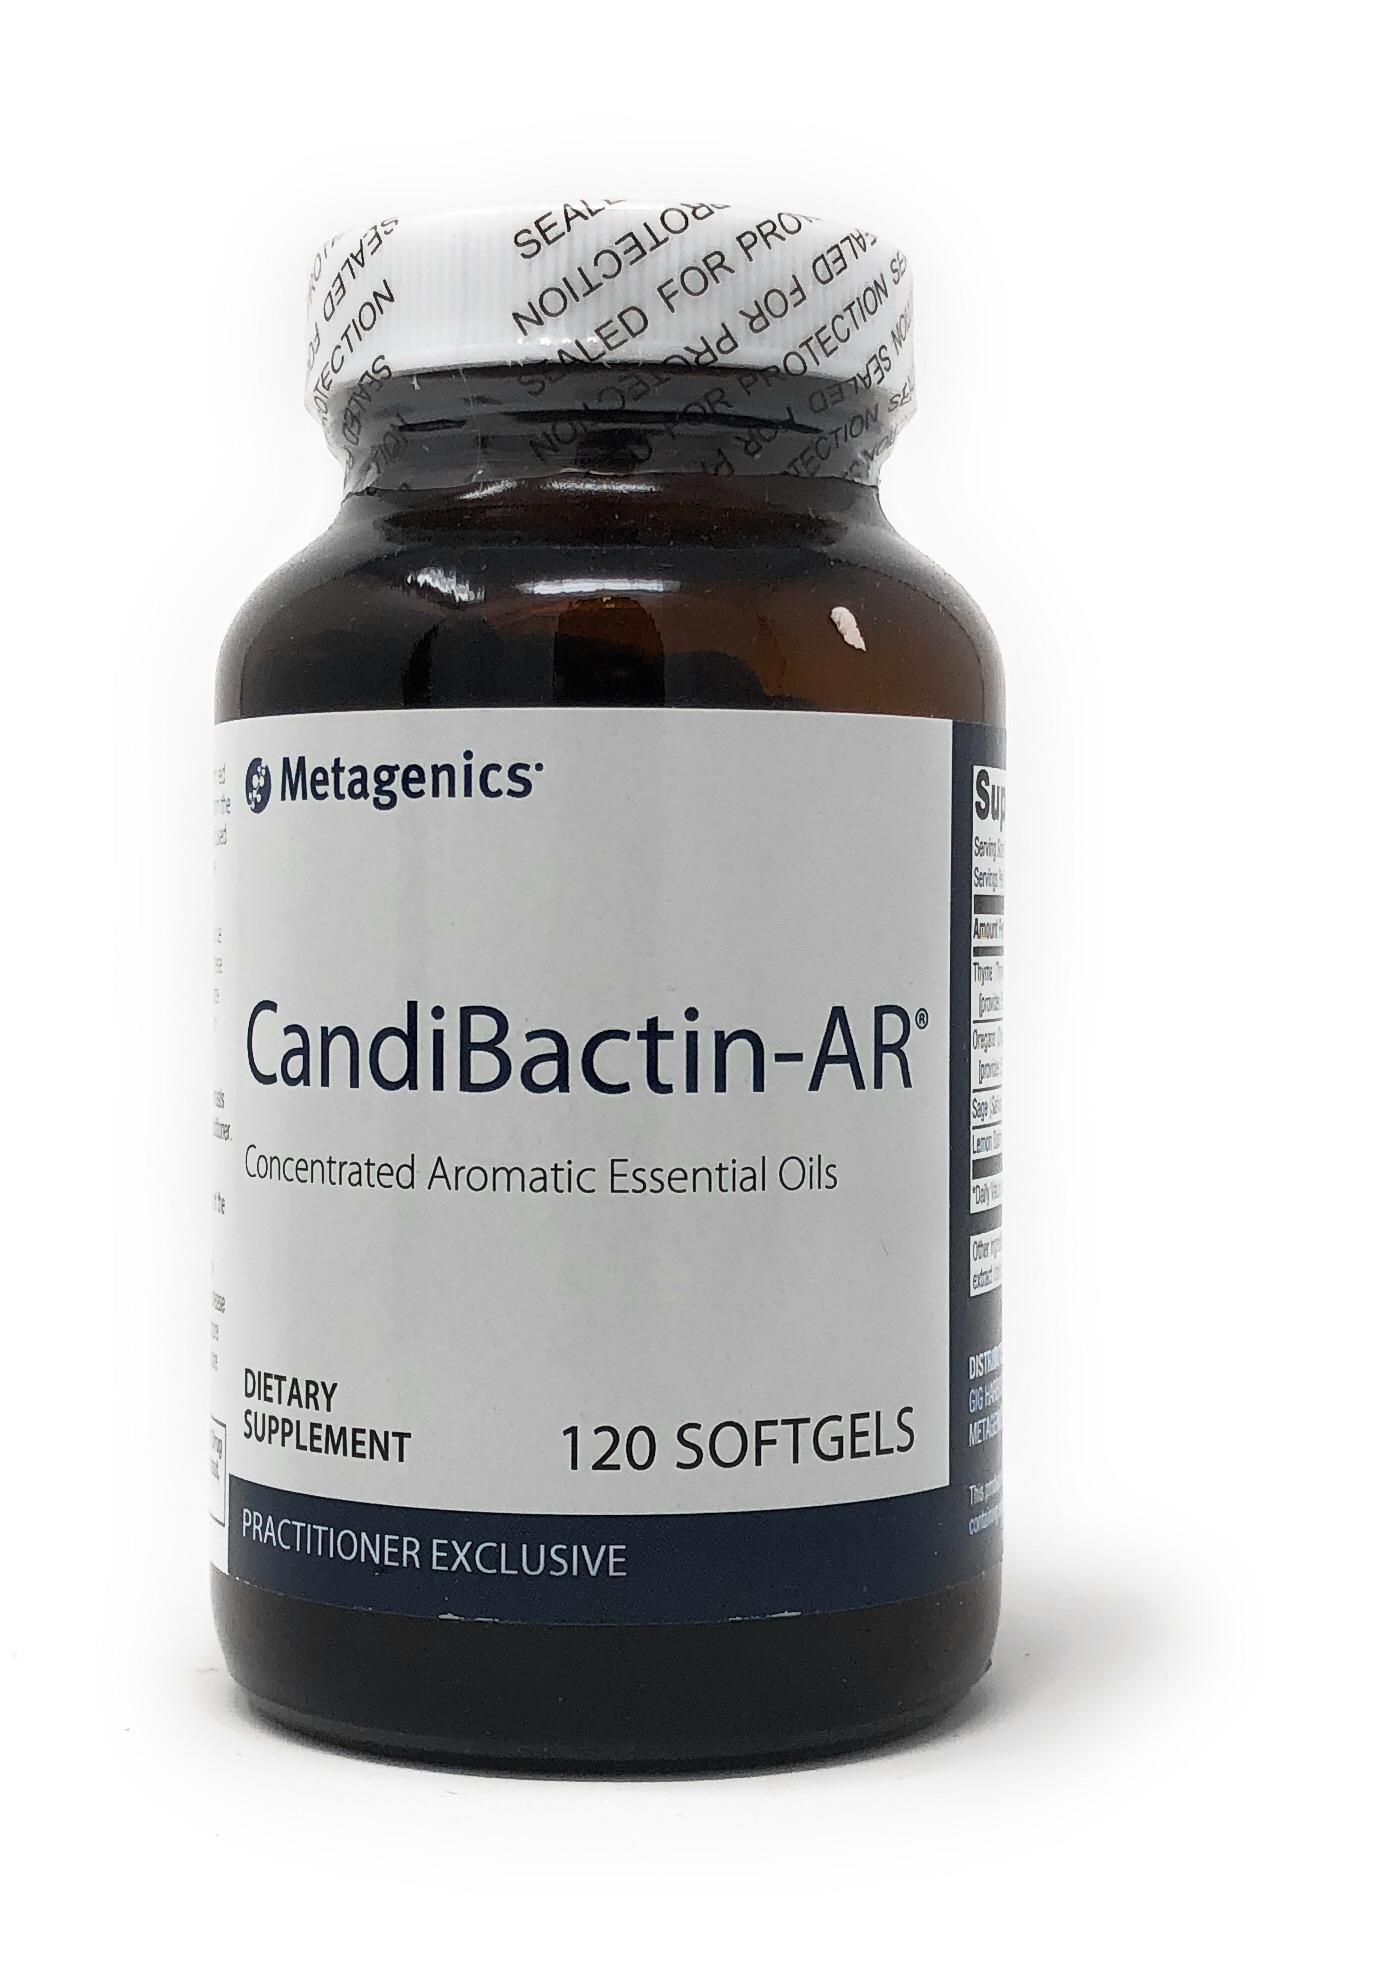 Metagenics Candibactin-AR® 120 Softgels